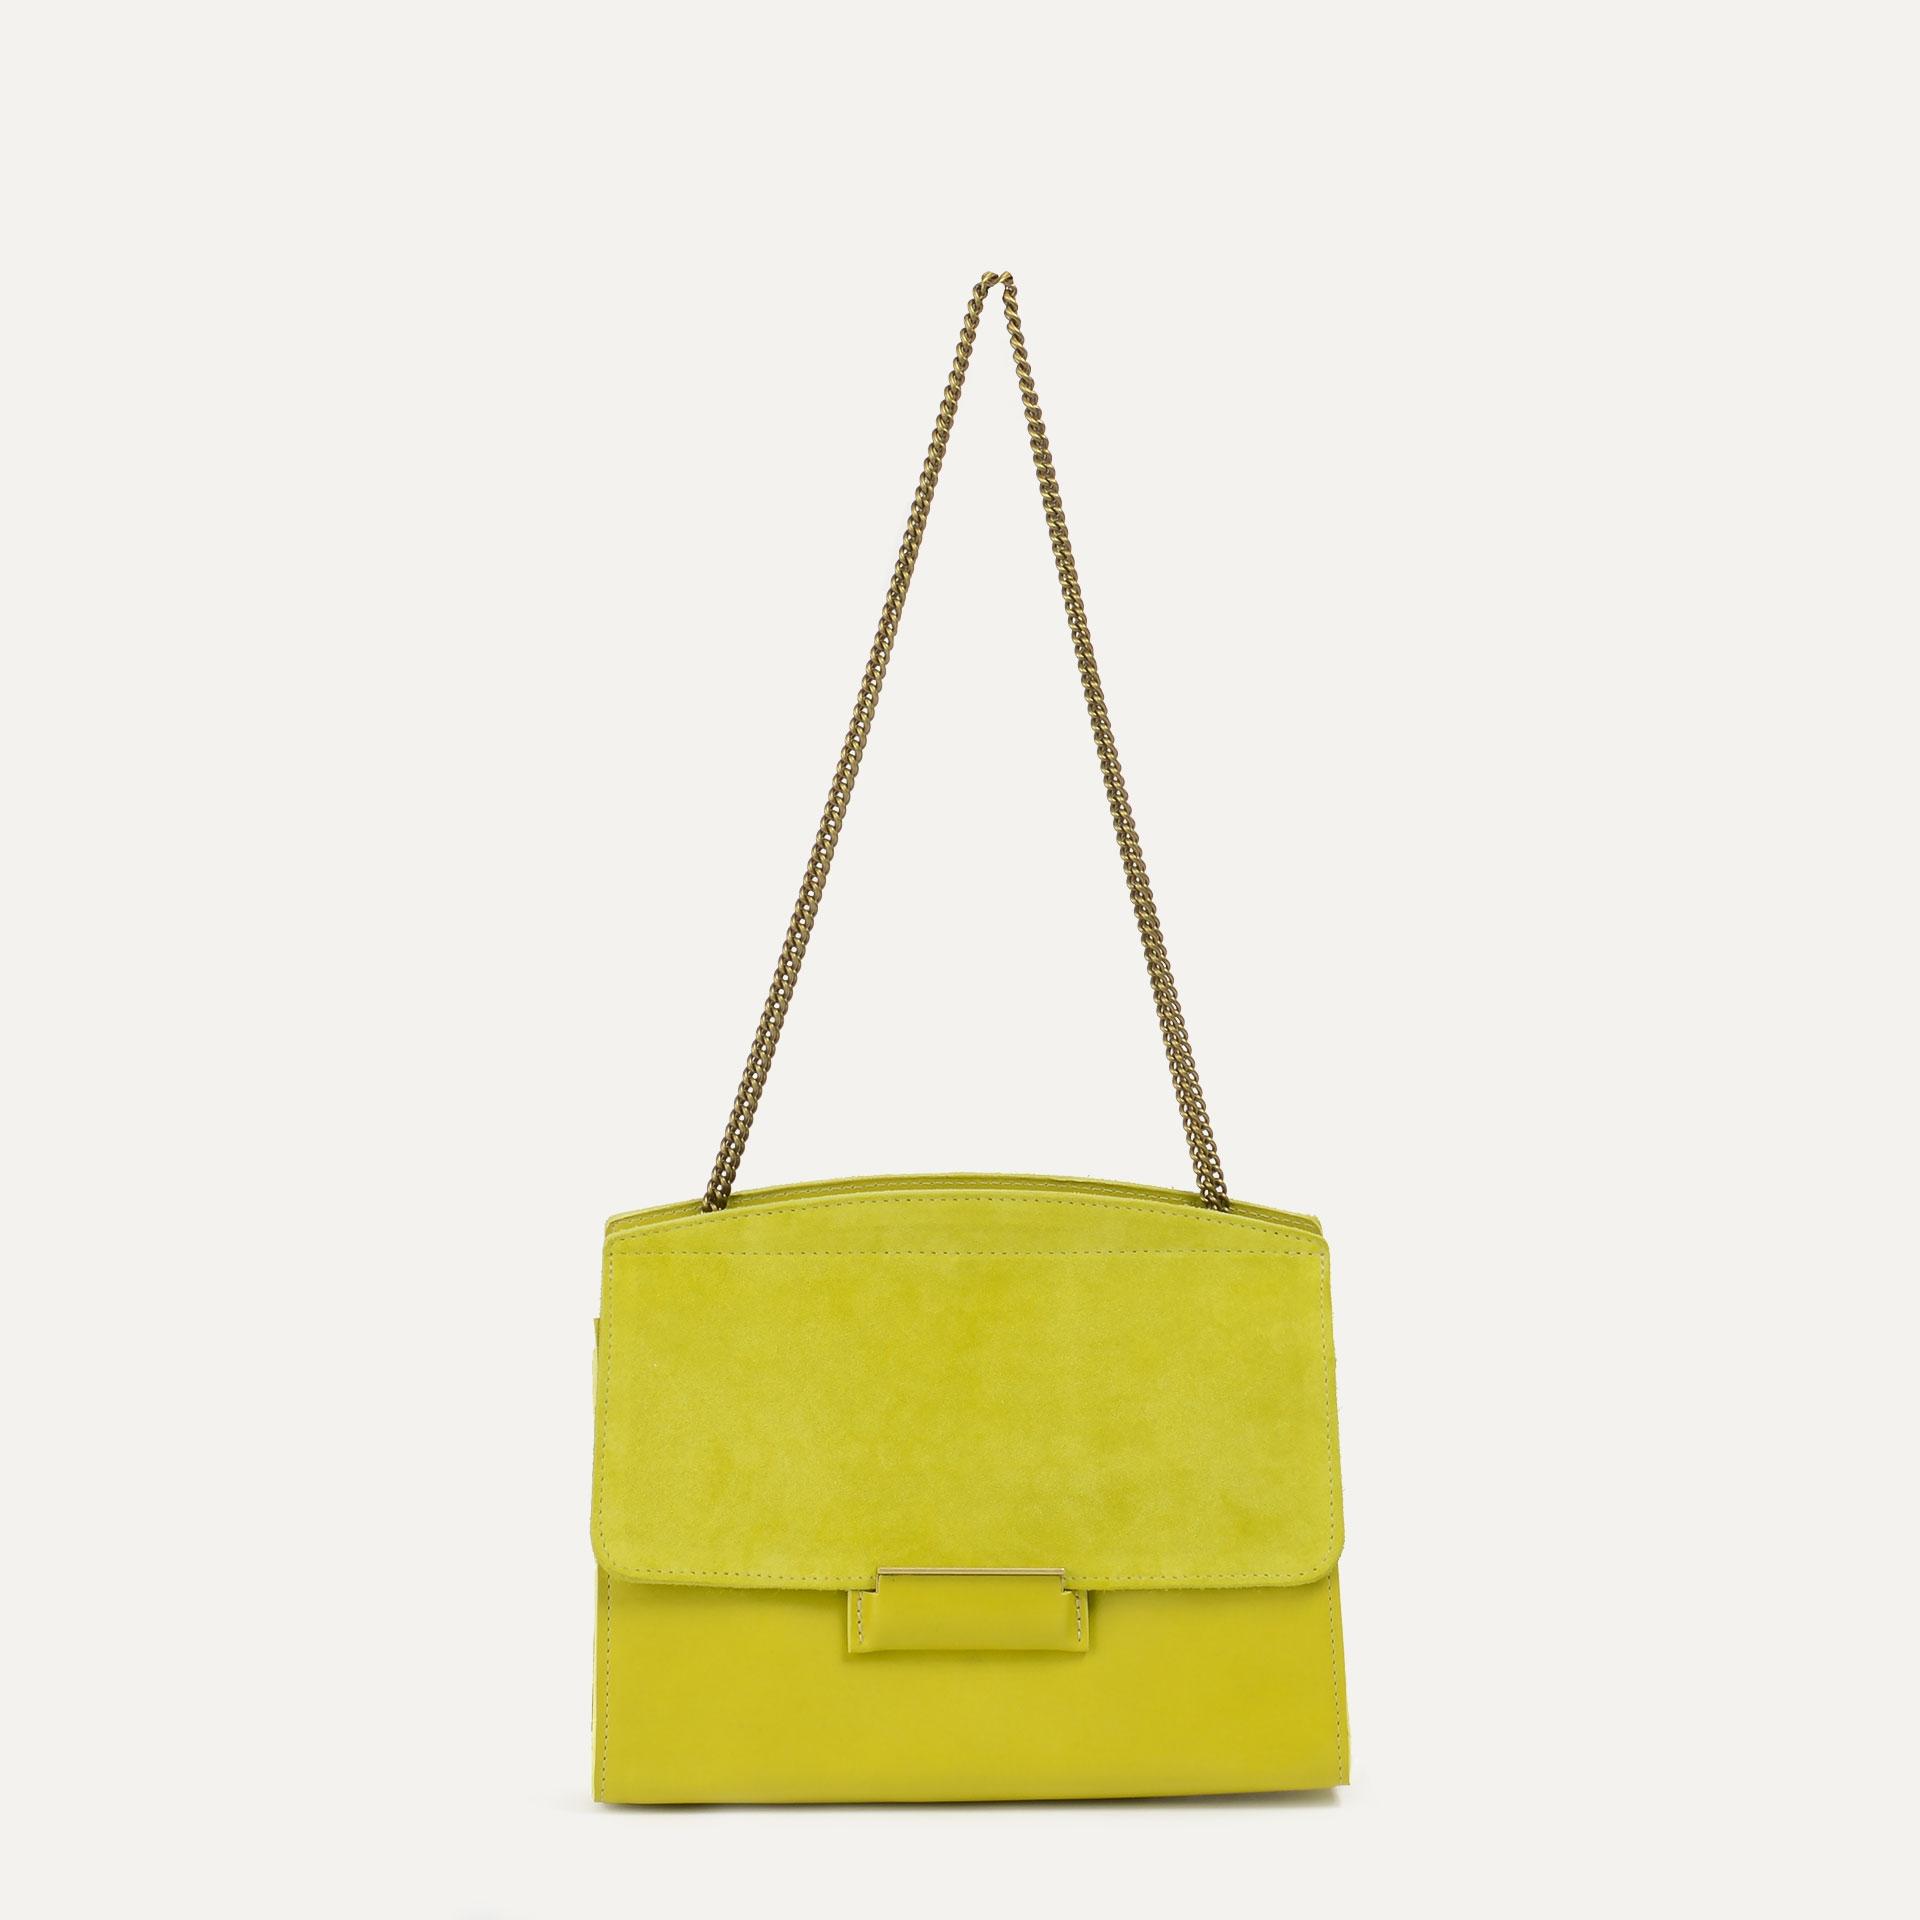 Origami S clutch bag - Bergamot (image n°1)